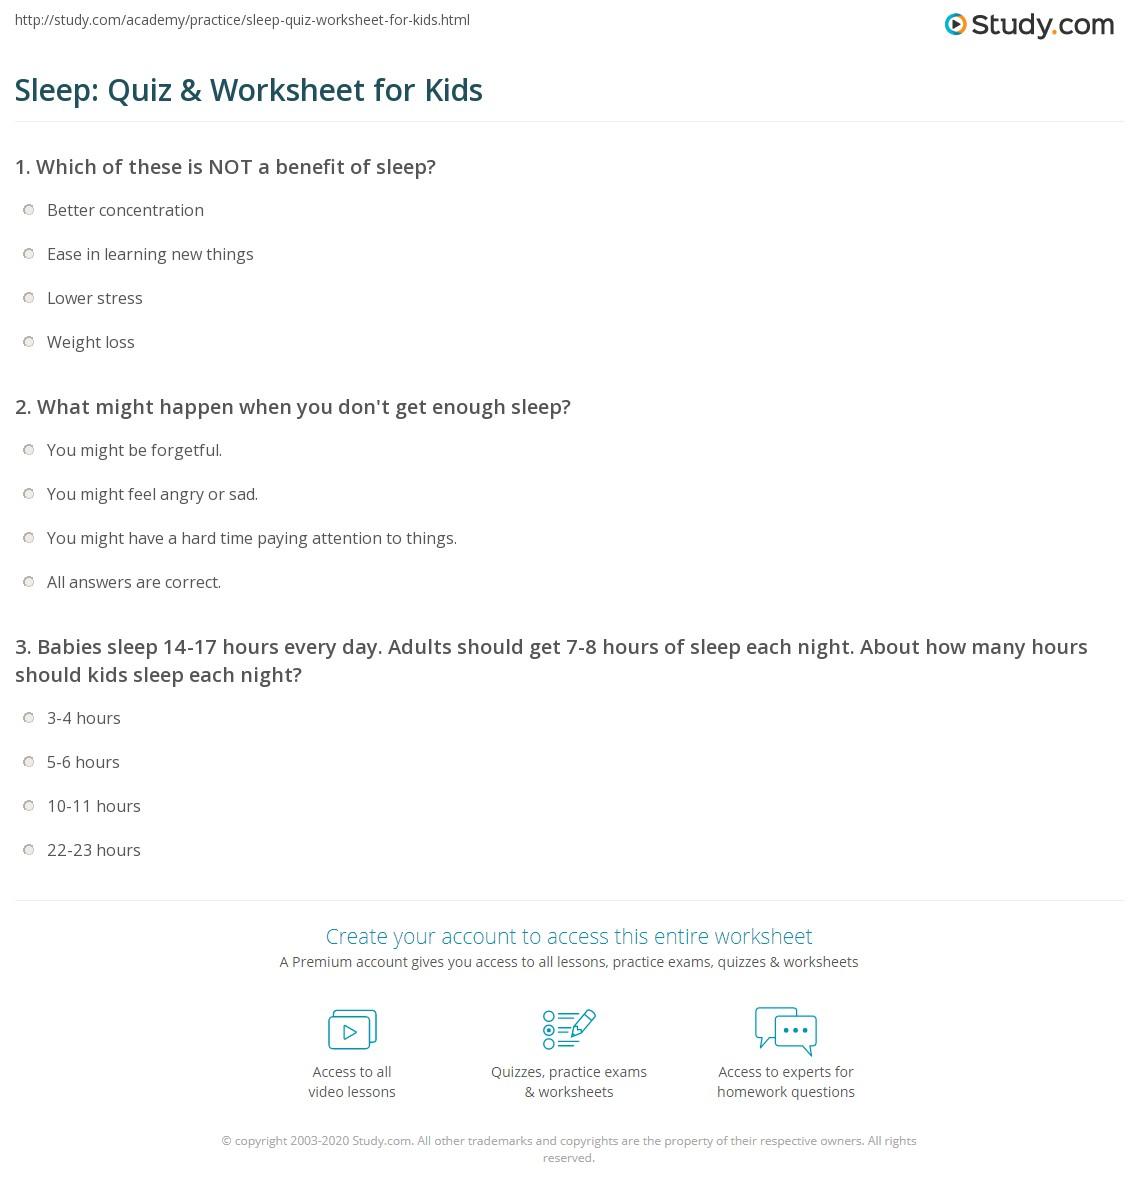 Worksheets Sleep Hygiene Worksheet sleep quiz worksheet for kids study com print lesson facts importance worksheet